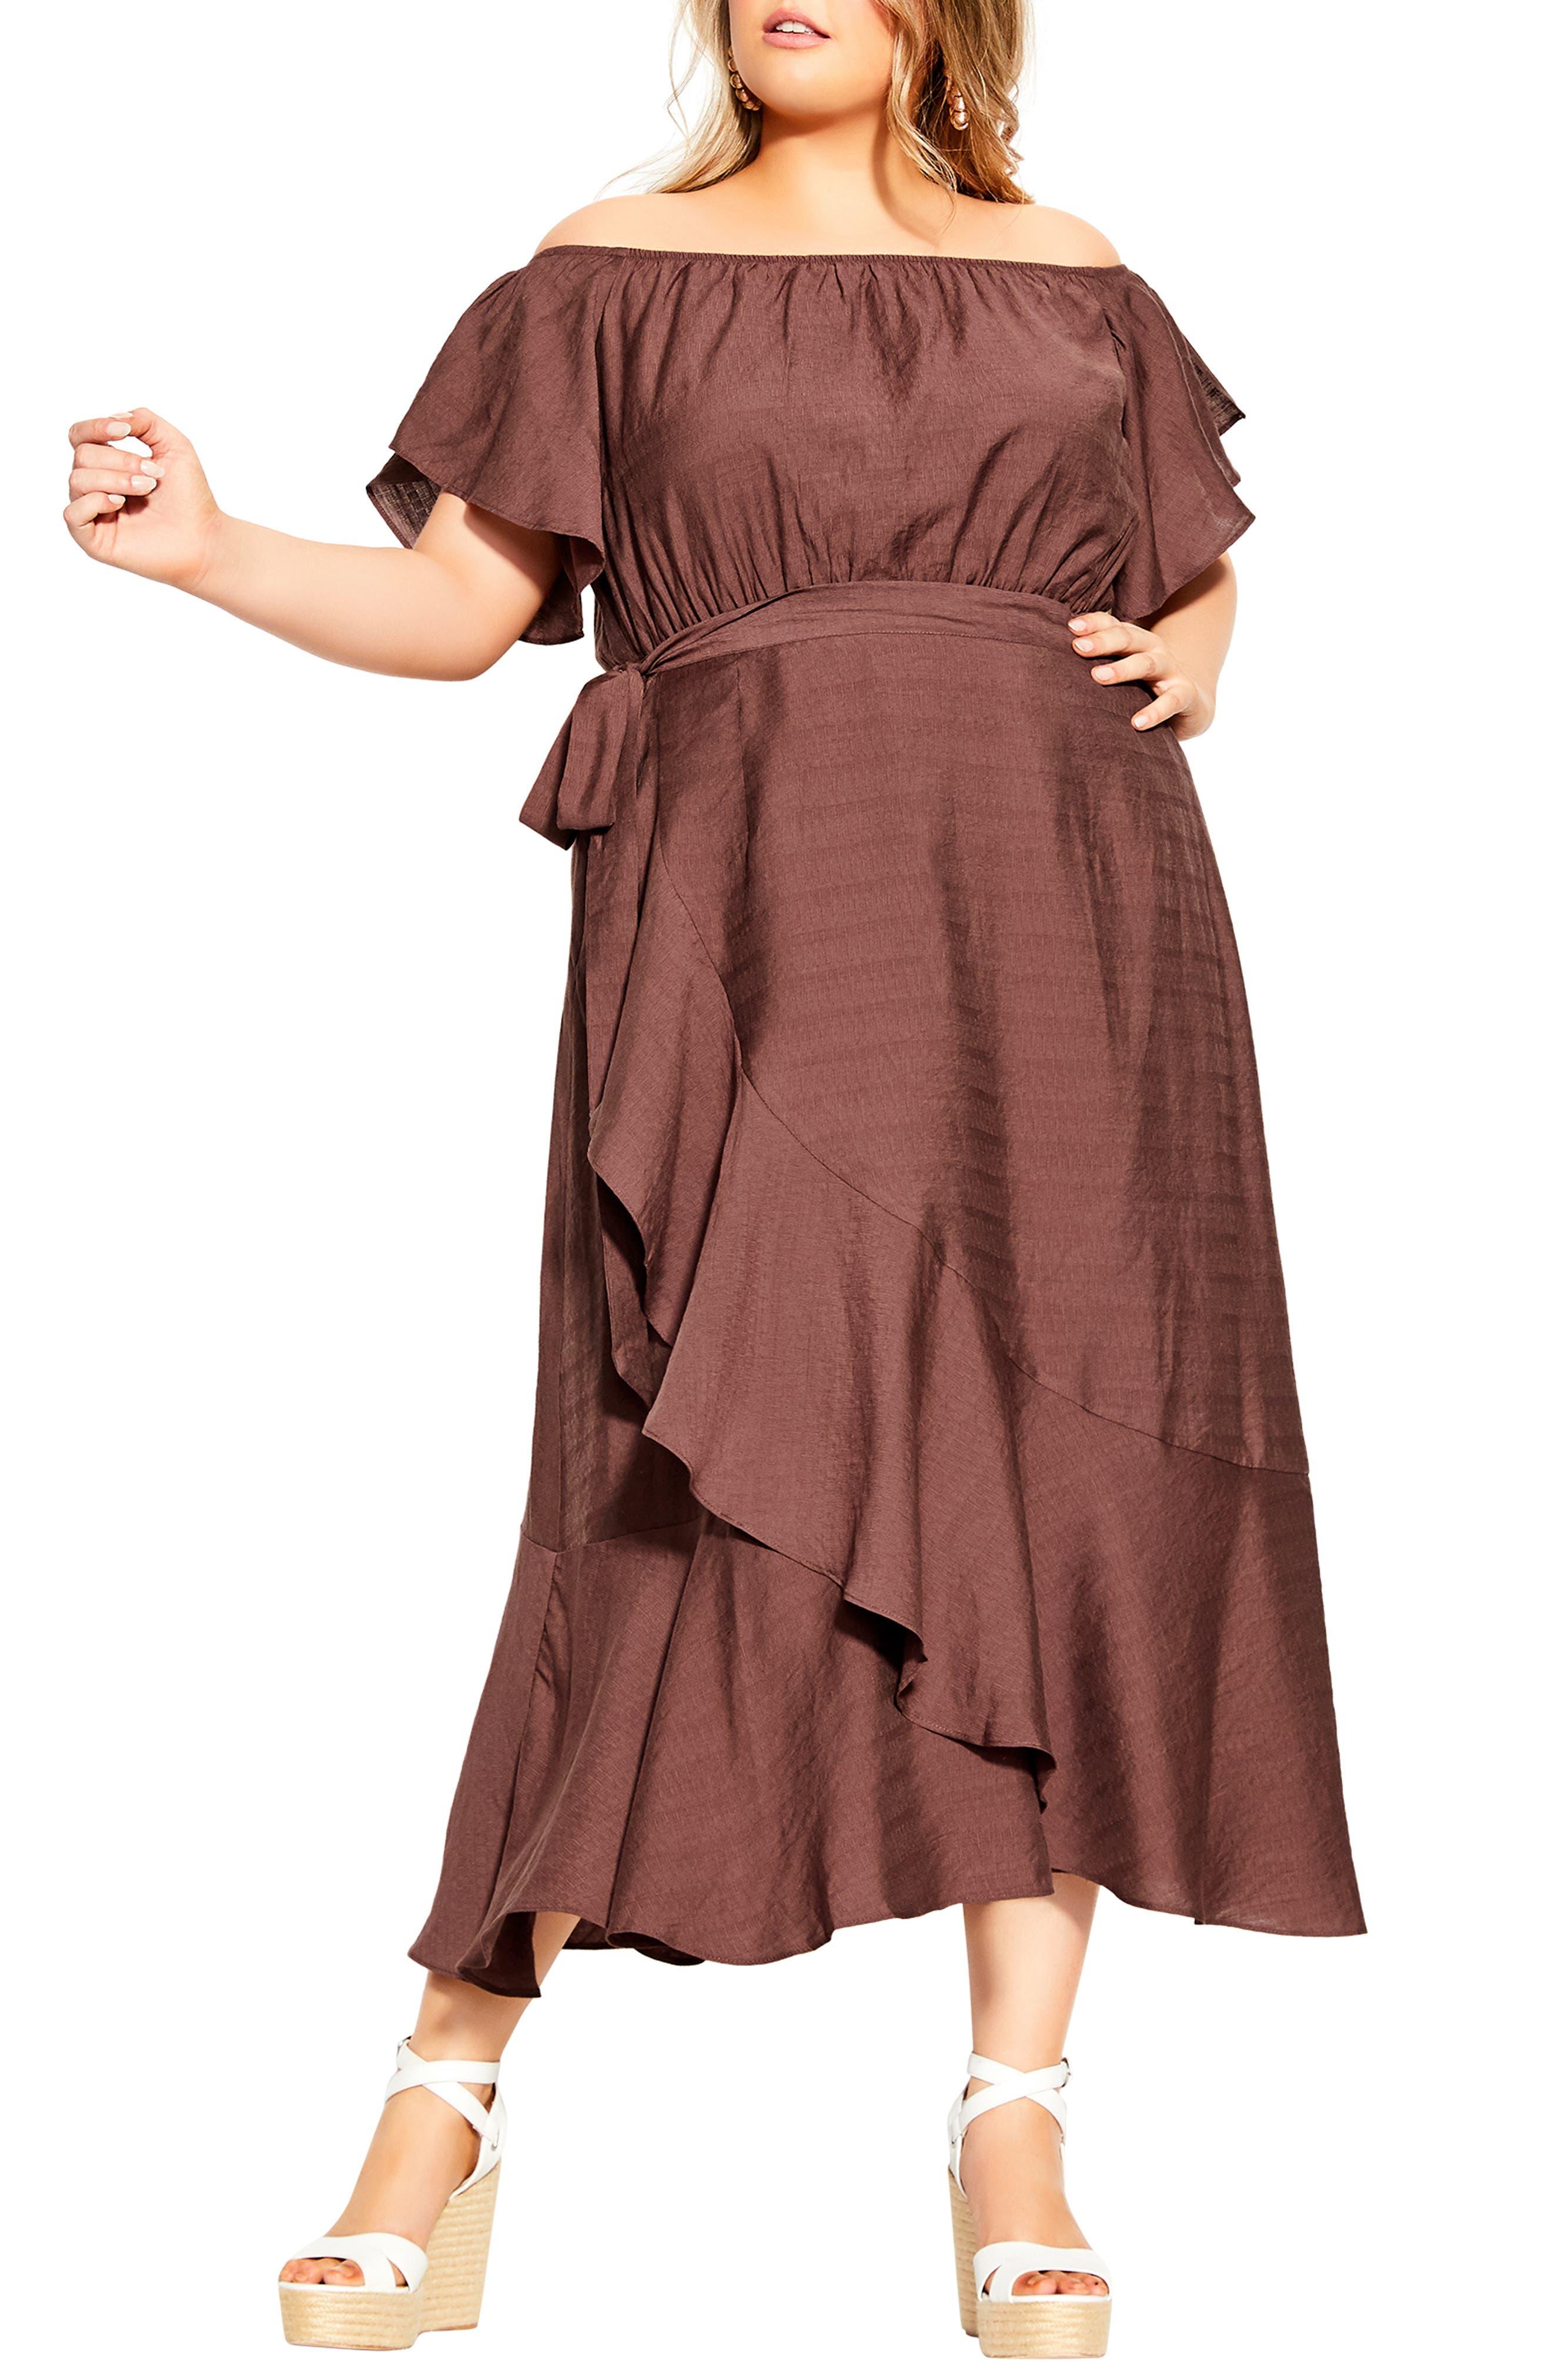 Inspiration Off The Shoulder Tiered Dress